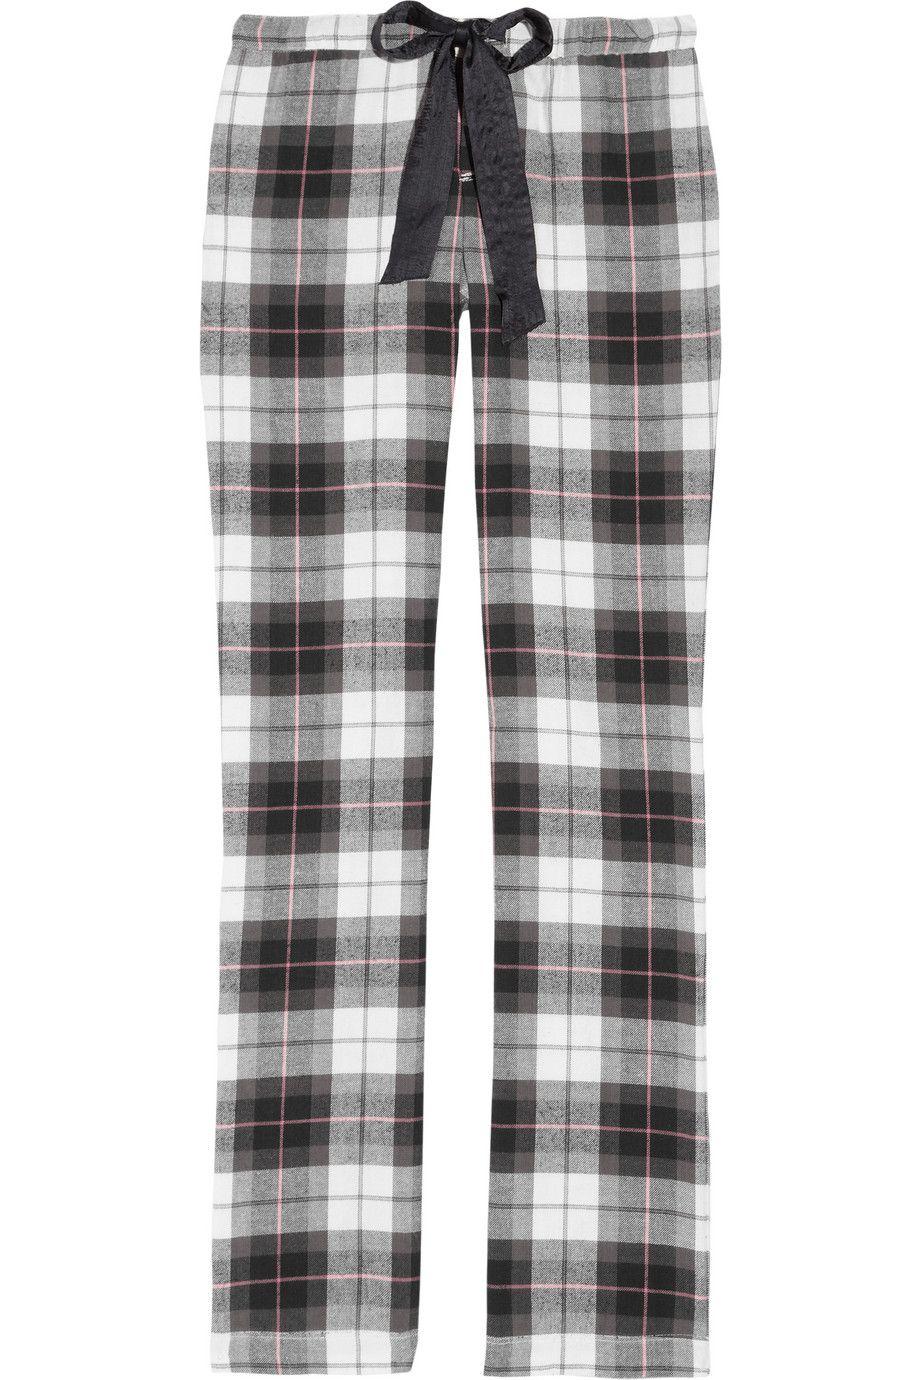 17 Best images about Pajama pants :) on Pinterest | Lounges, Plaid ...